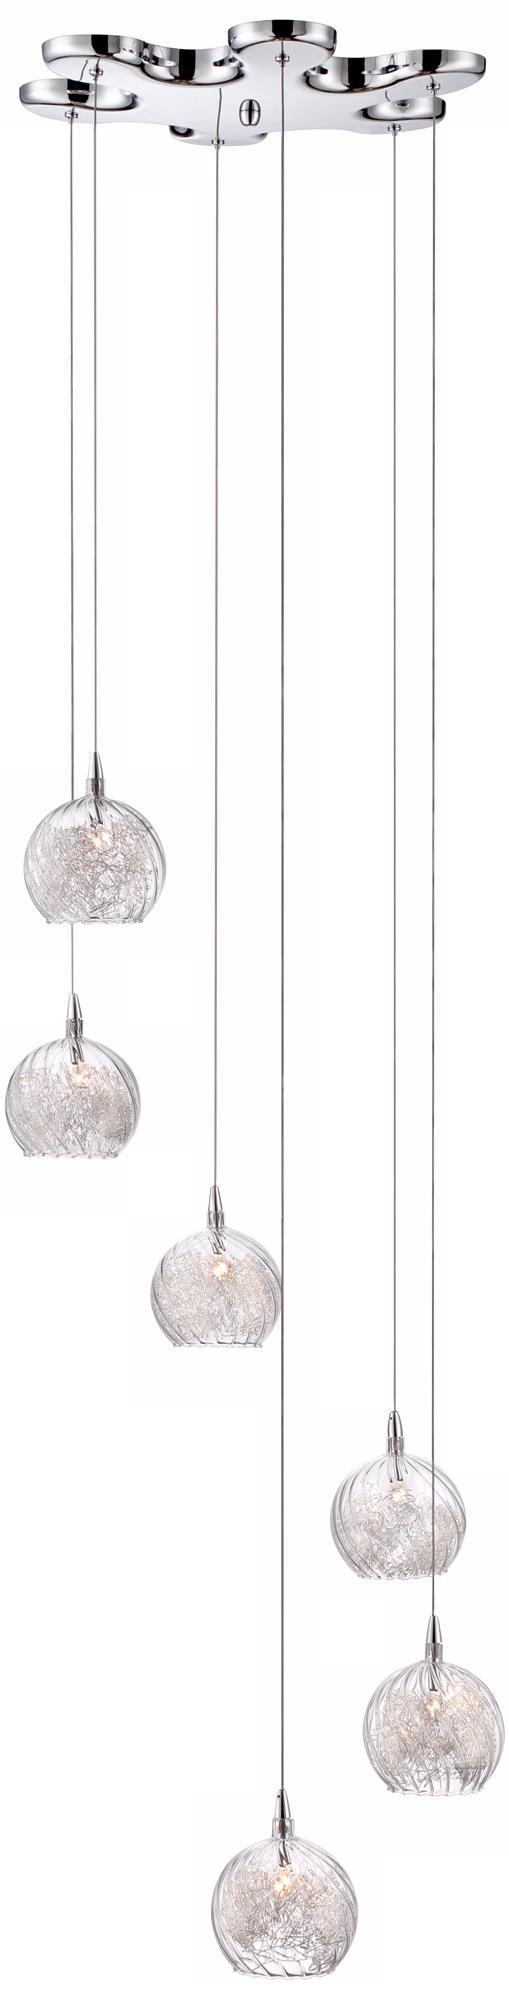 possini euro lighting. Possini Euro Design Wired 18\ Lighting